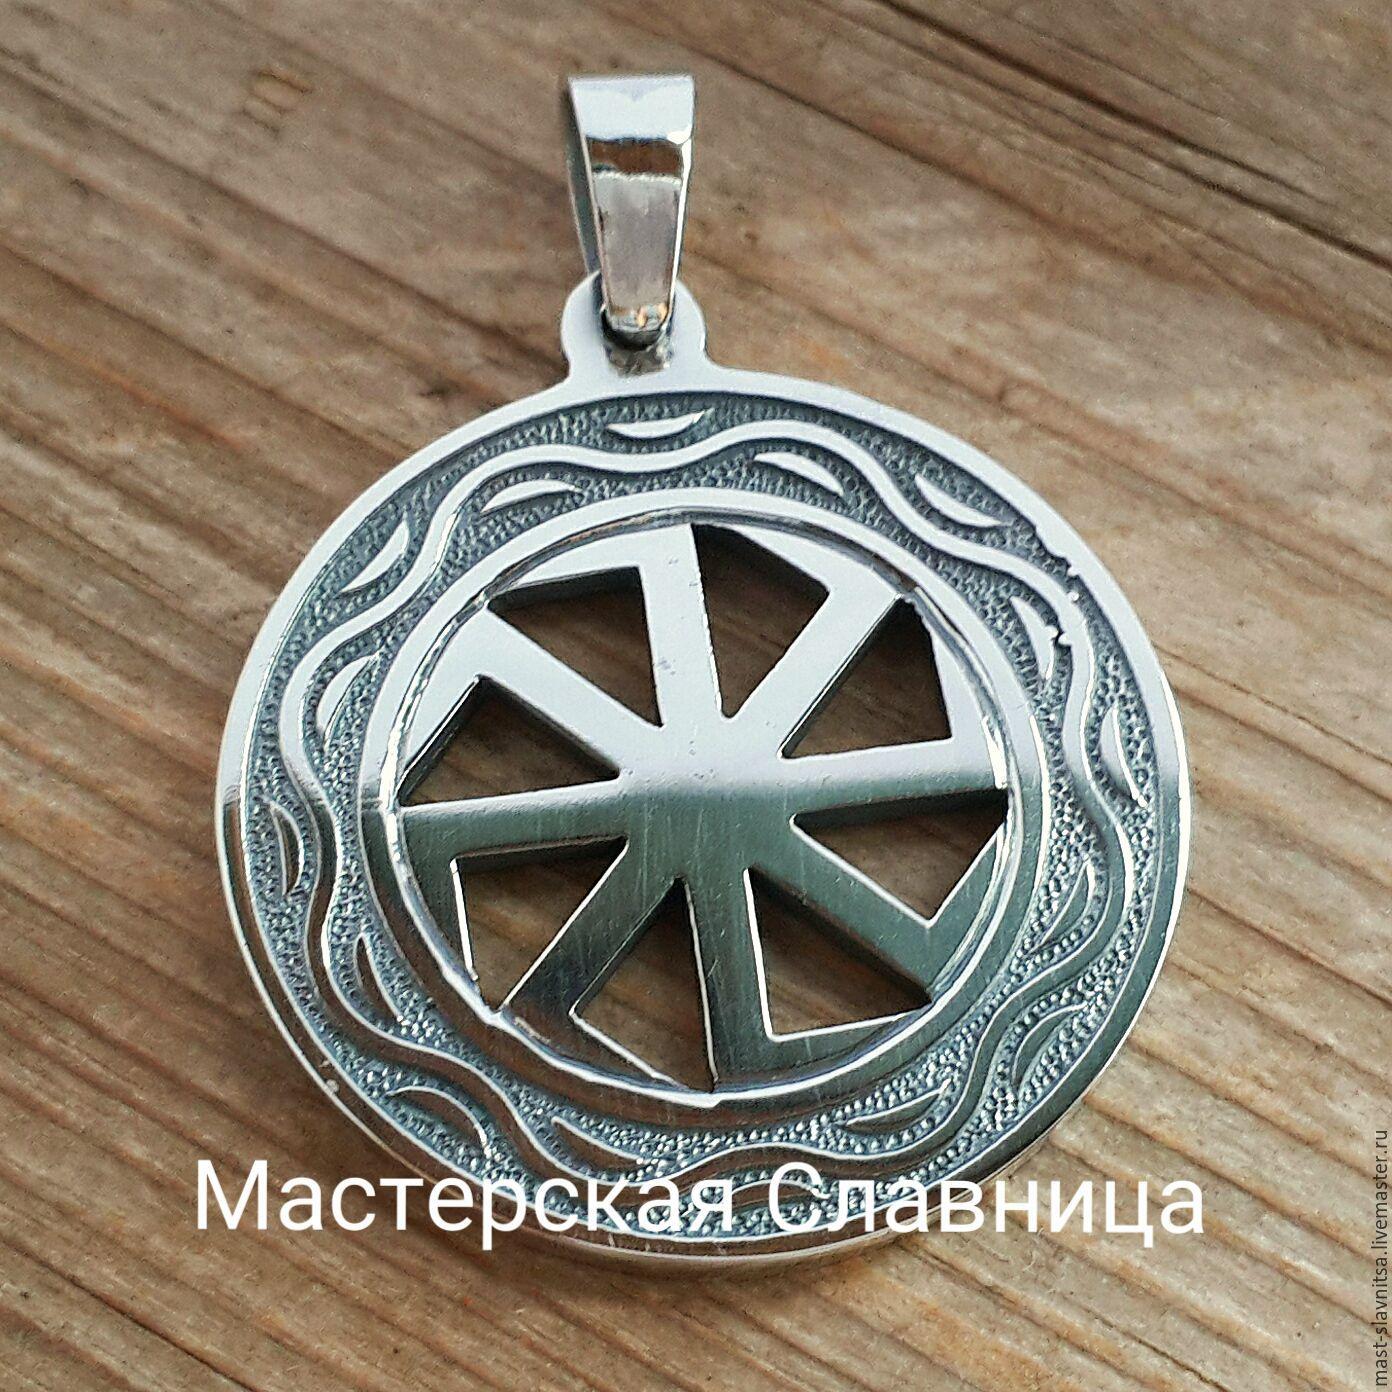 Славянский Коловрат из серебра, Подвески, Пятигорск, Фото №1